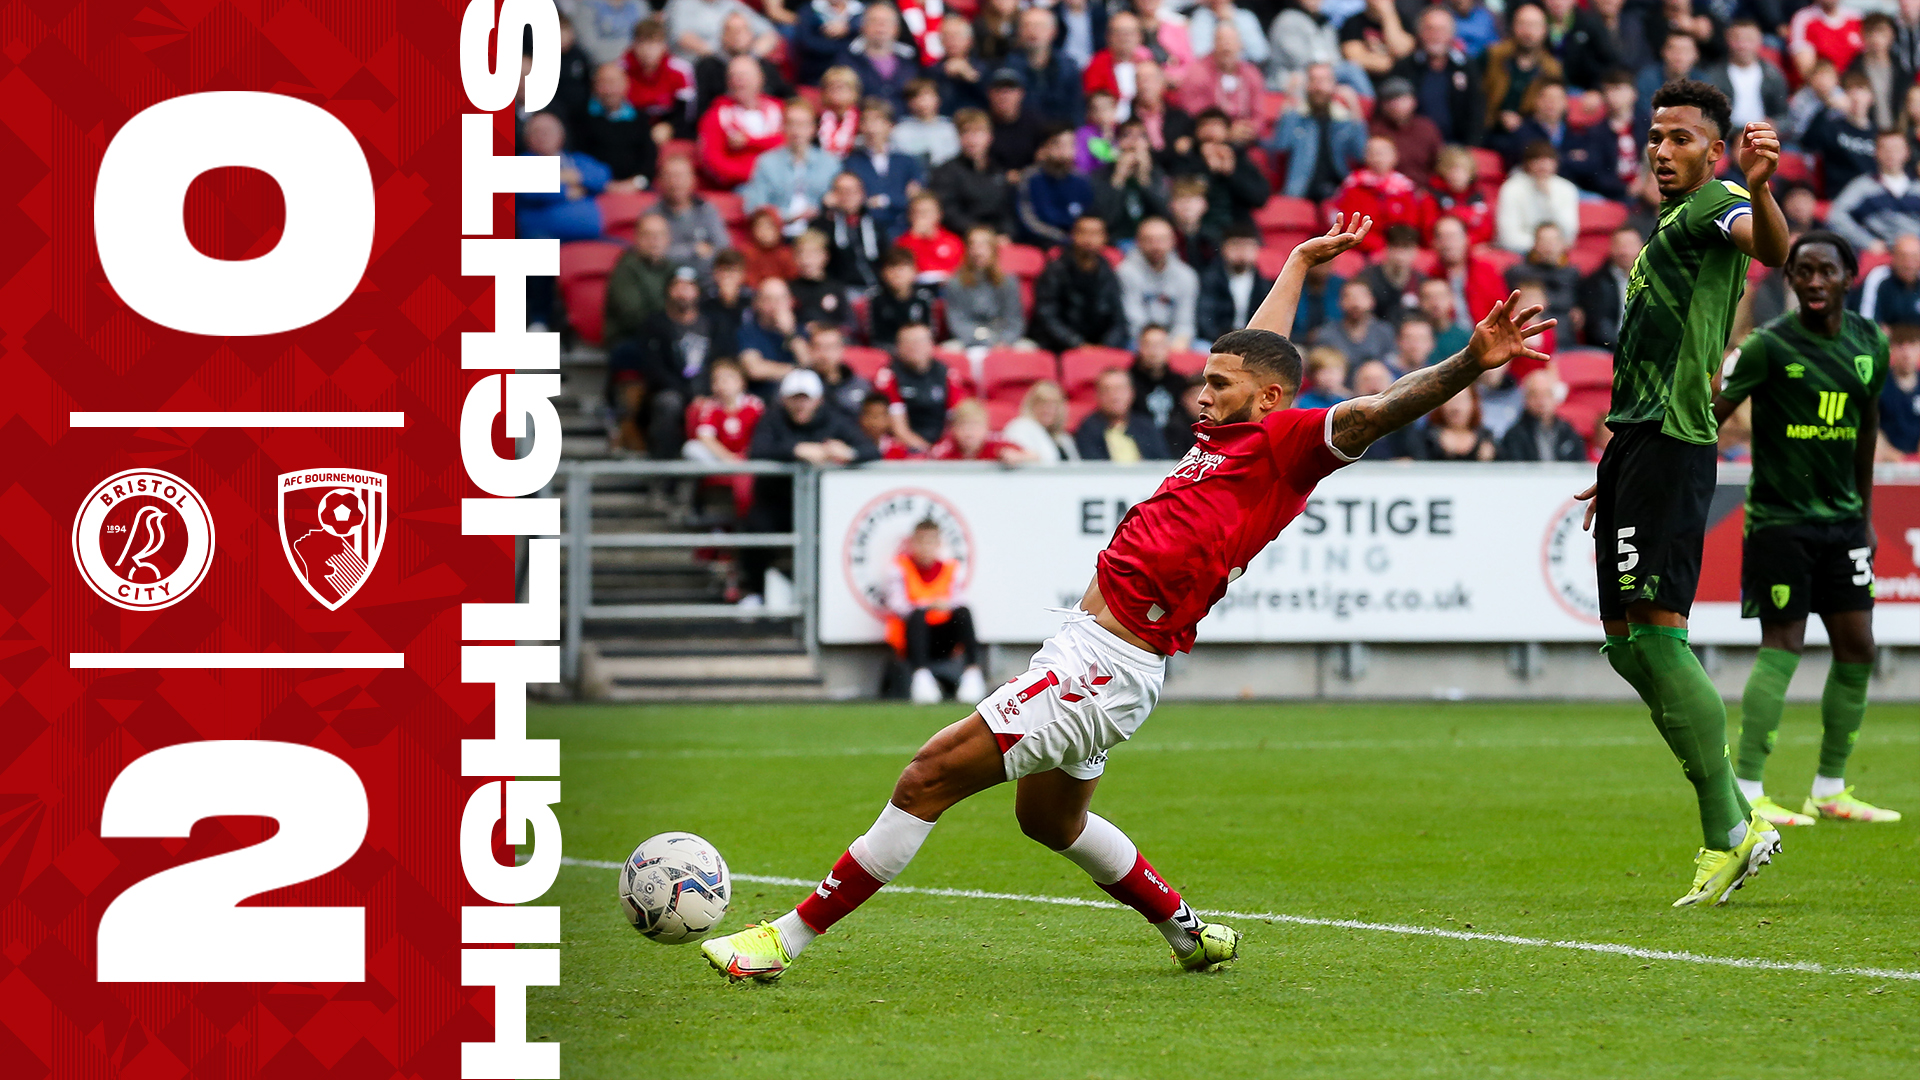 Bristol City 0-2 AFC Bournemouth